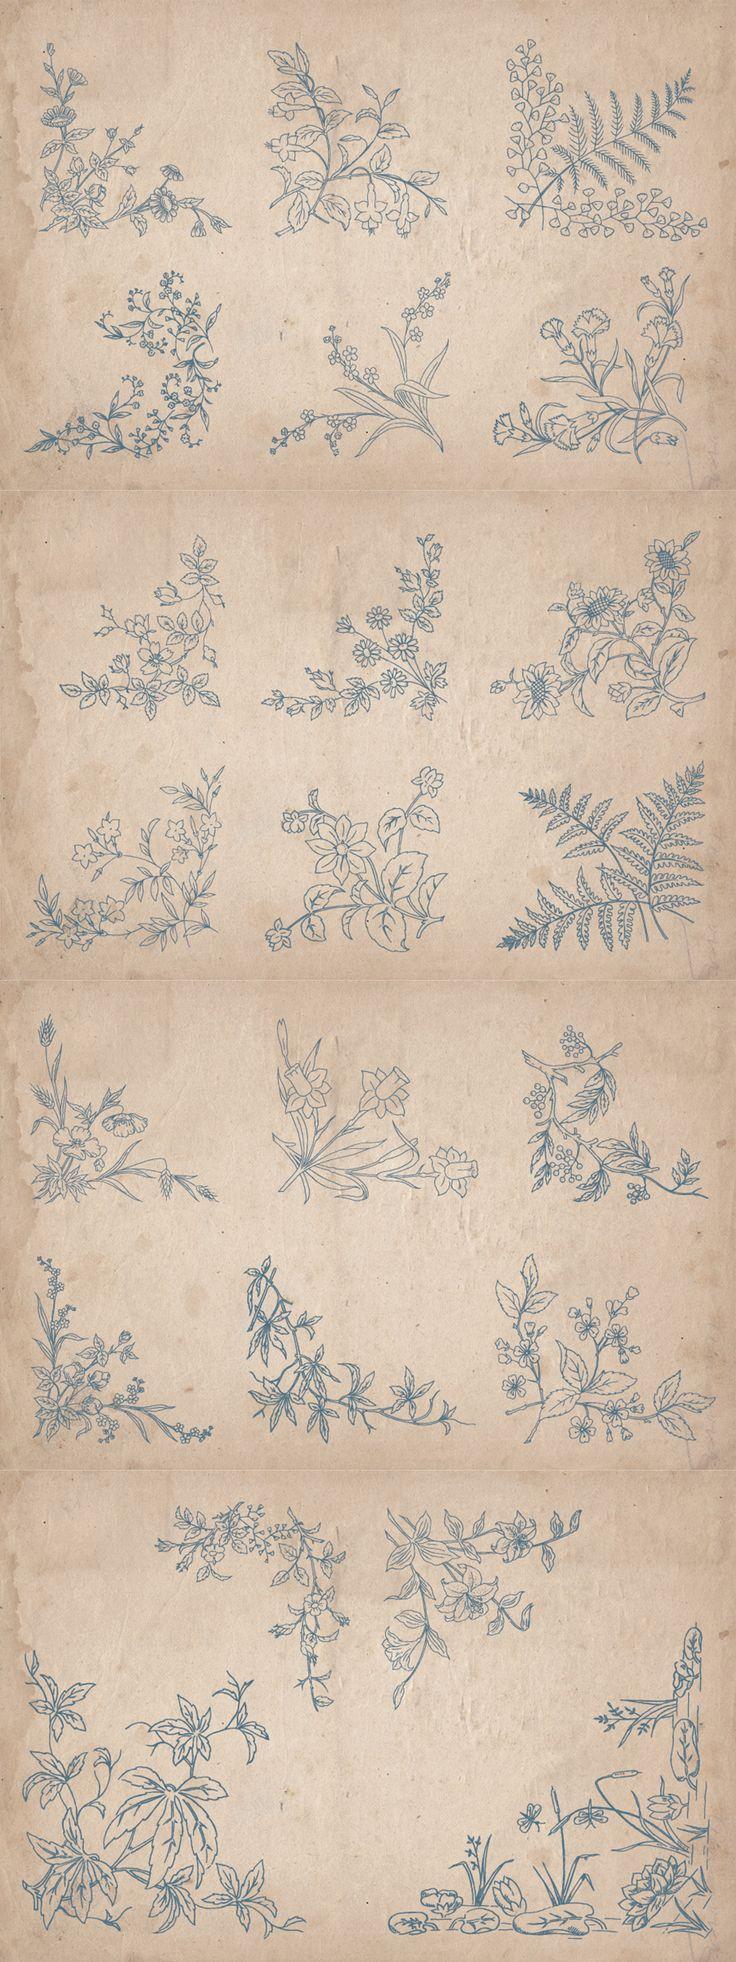 22 Vintage Floral Corners - https://www.designcuts.com/product/22-vintage-floral-corners/